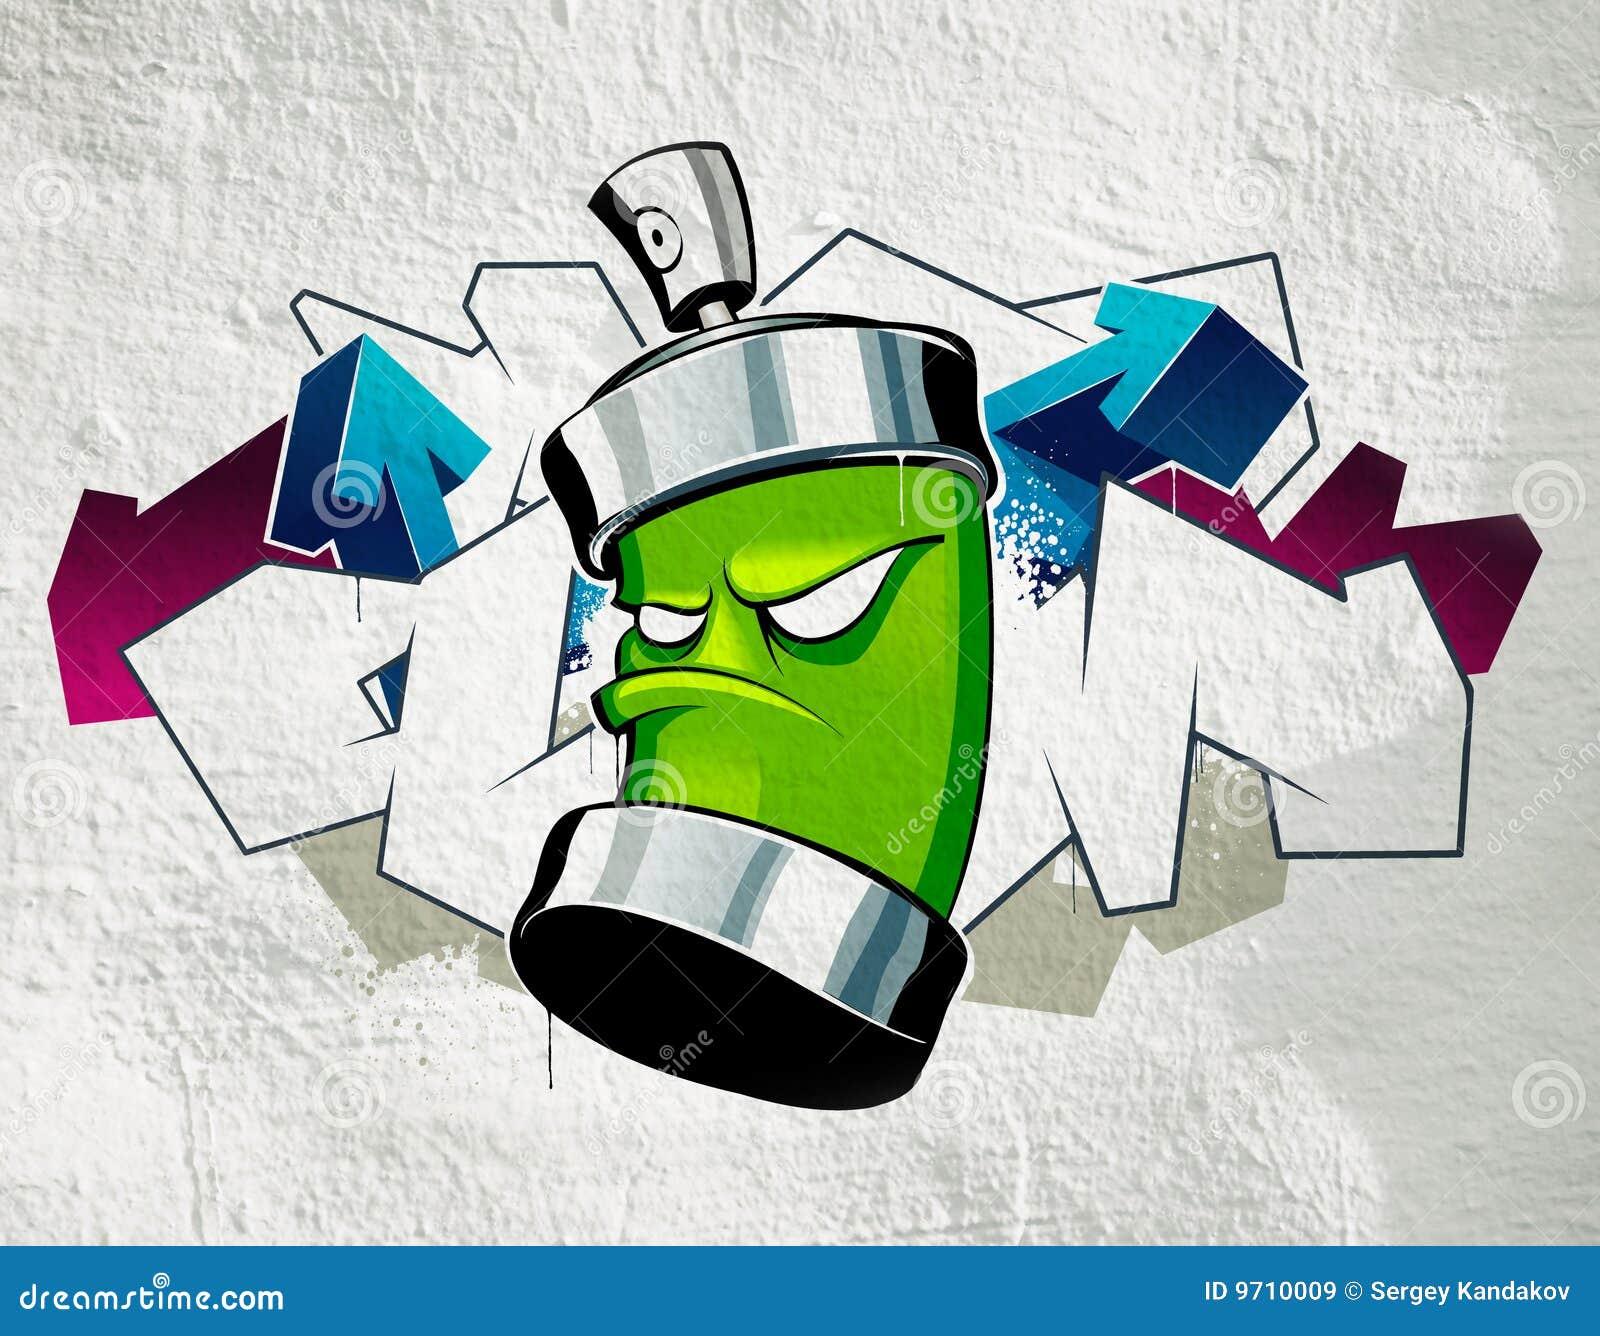 cool graffiti stock illustration illustration of extreme 9710009. Black Bedroom Furniture Sets. Home Design Ideas